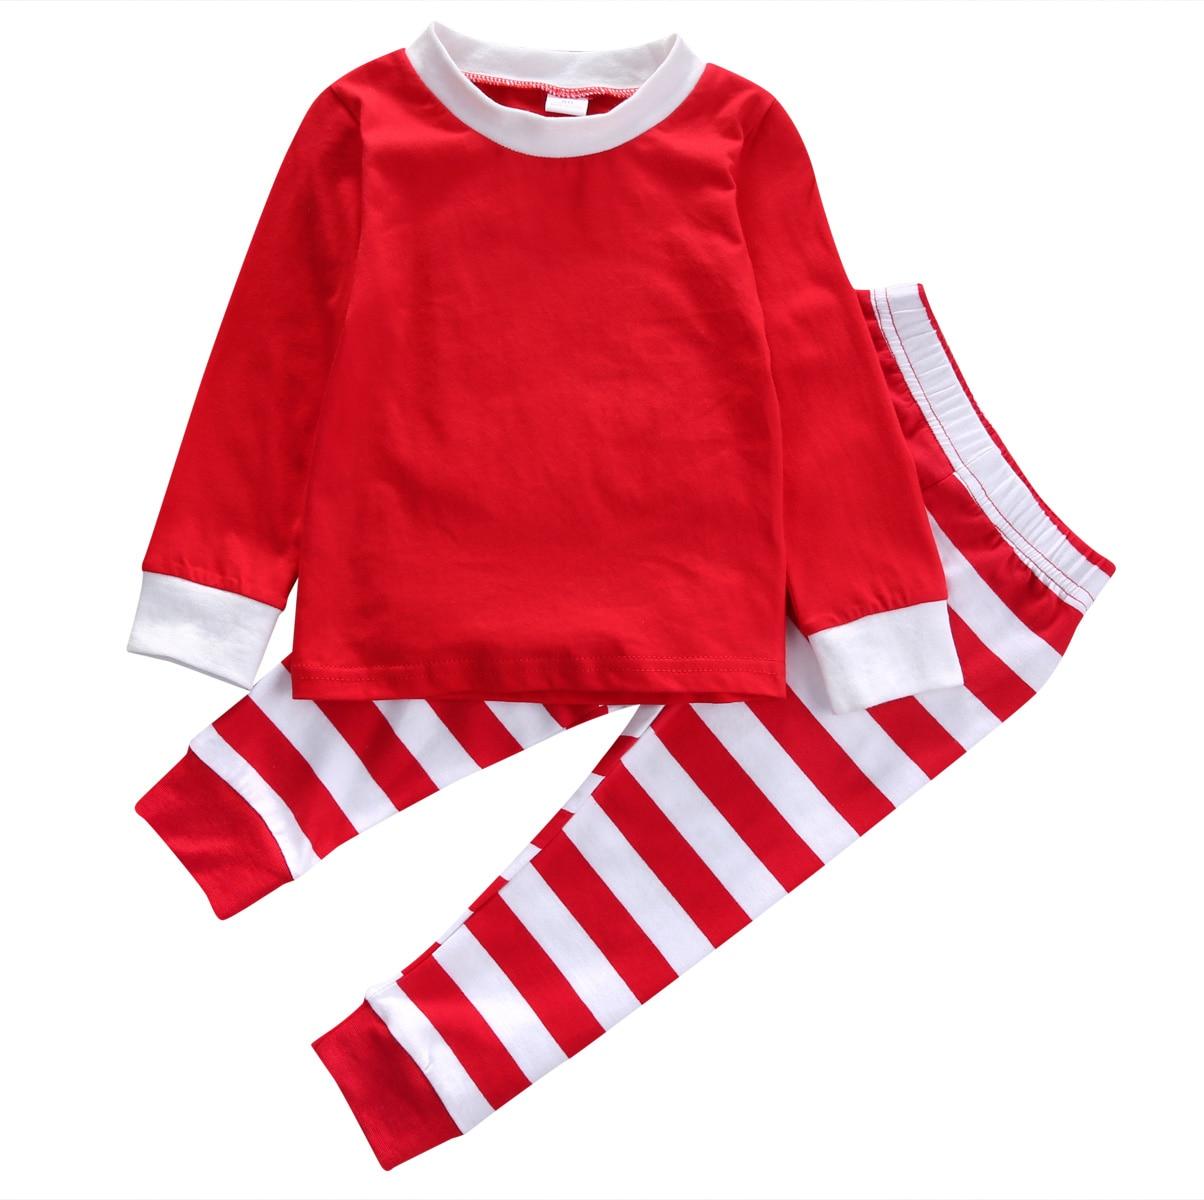 2pcs Toddler Kids Baby Boy Girls Striped Outfits Christmas Pajamas Sleepwear  Set kigurumis Children s Pajamas nightwear 2016-in Pajama Sets from Mother  ... 3ae78ddd3